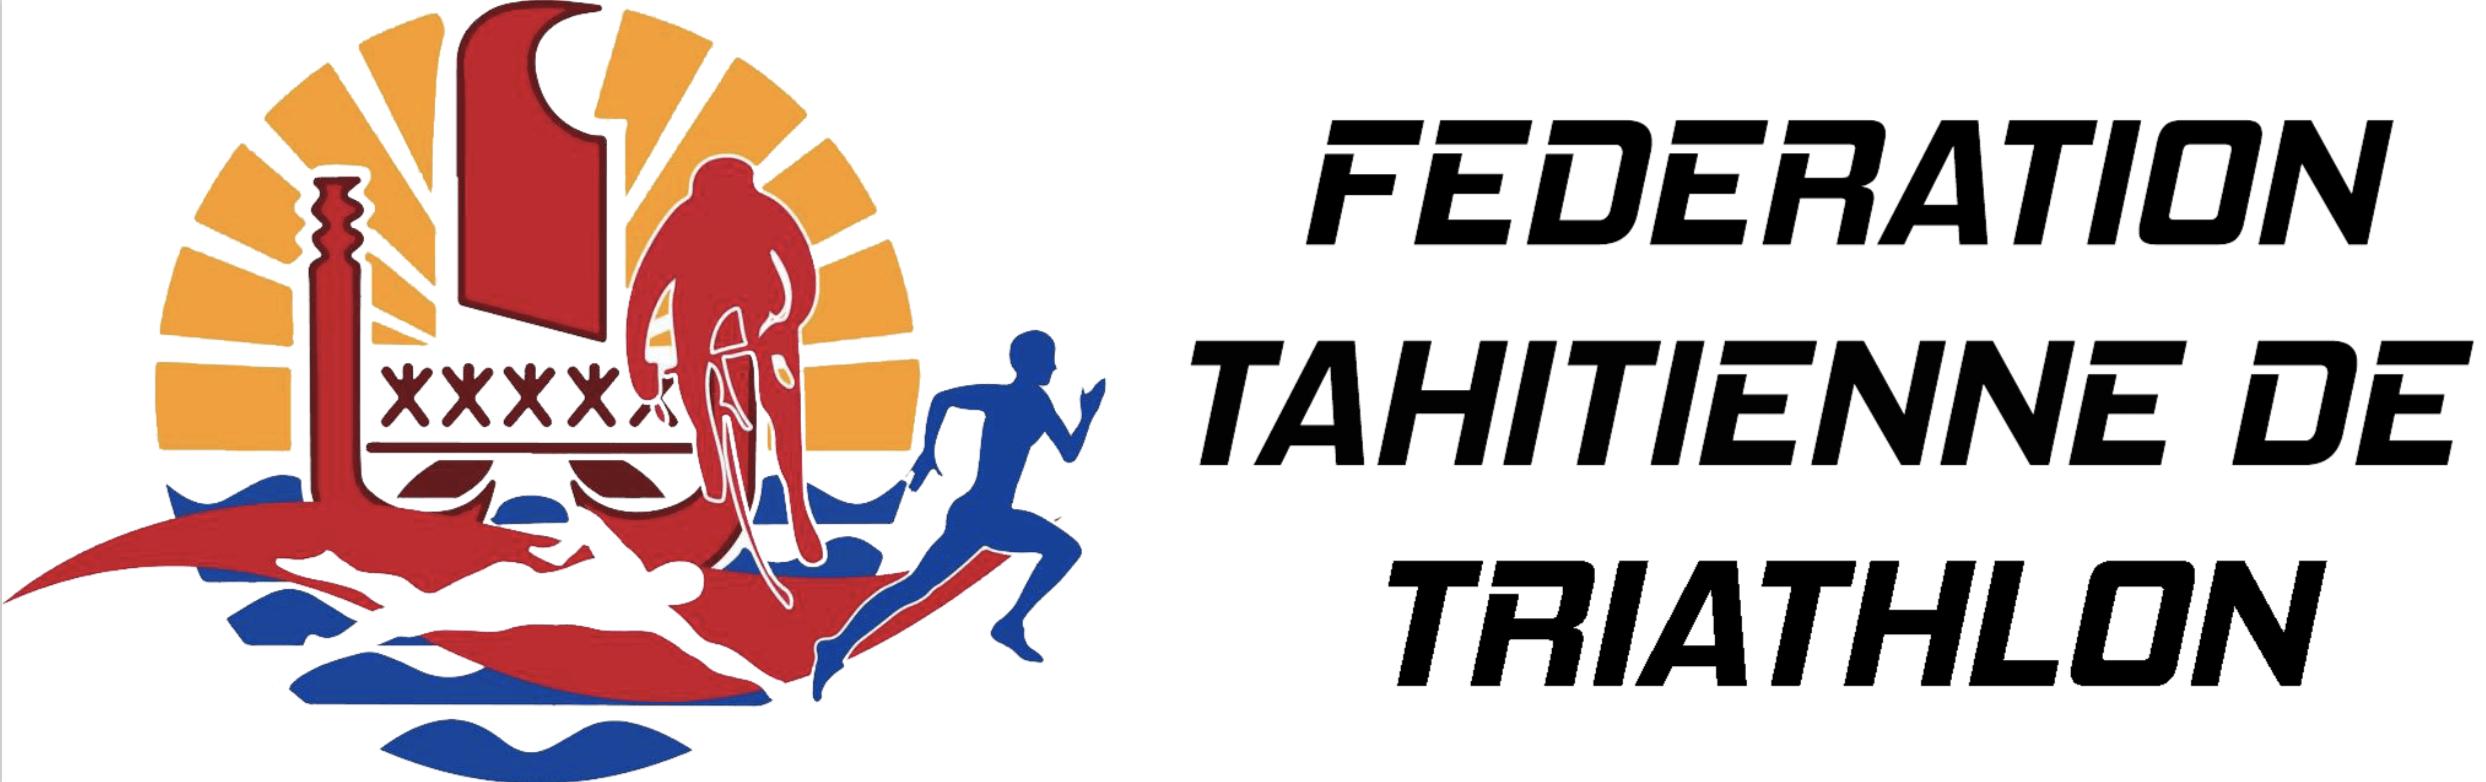 Fédération Tahitienne de Triathlon